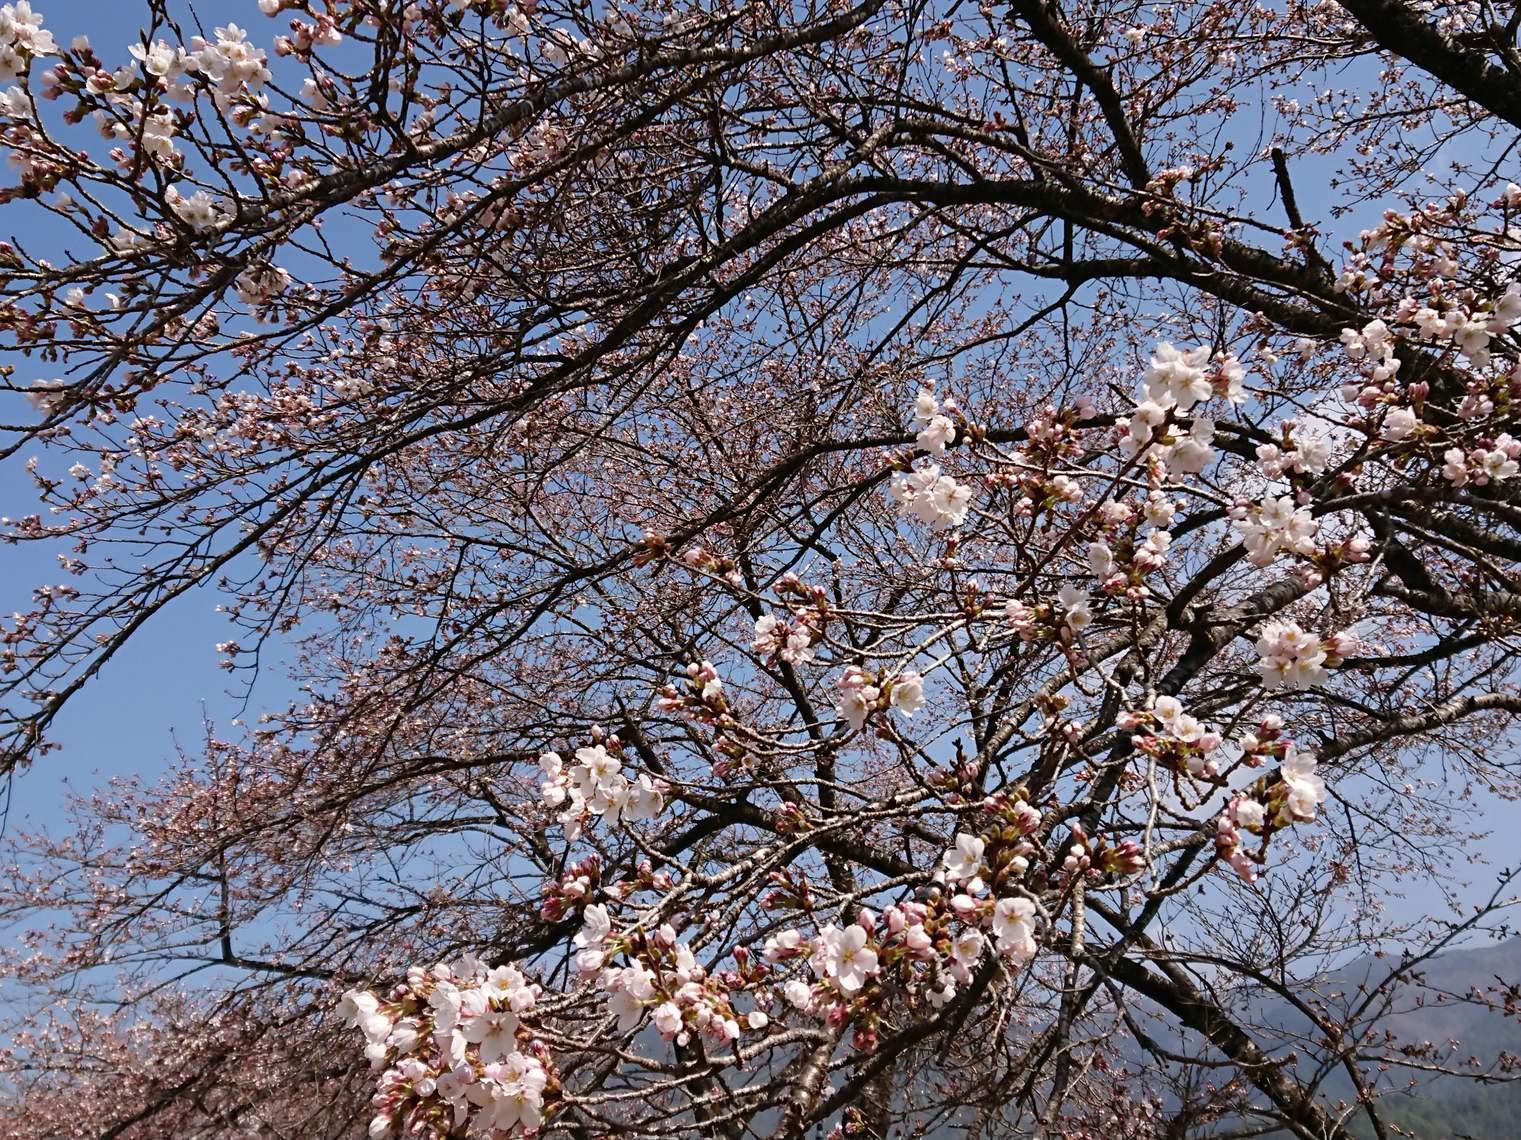 桜の開花情報_c0238069_10532536.jpg